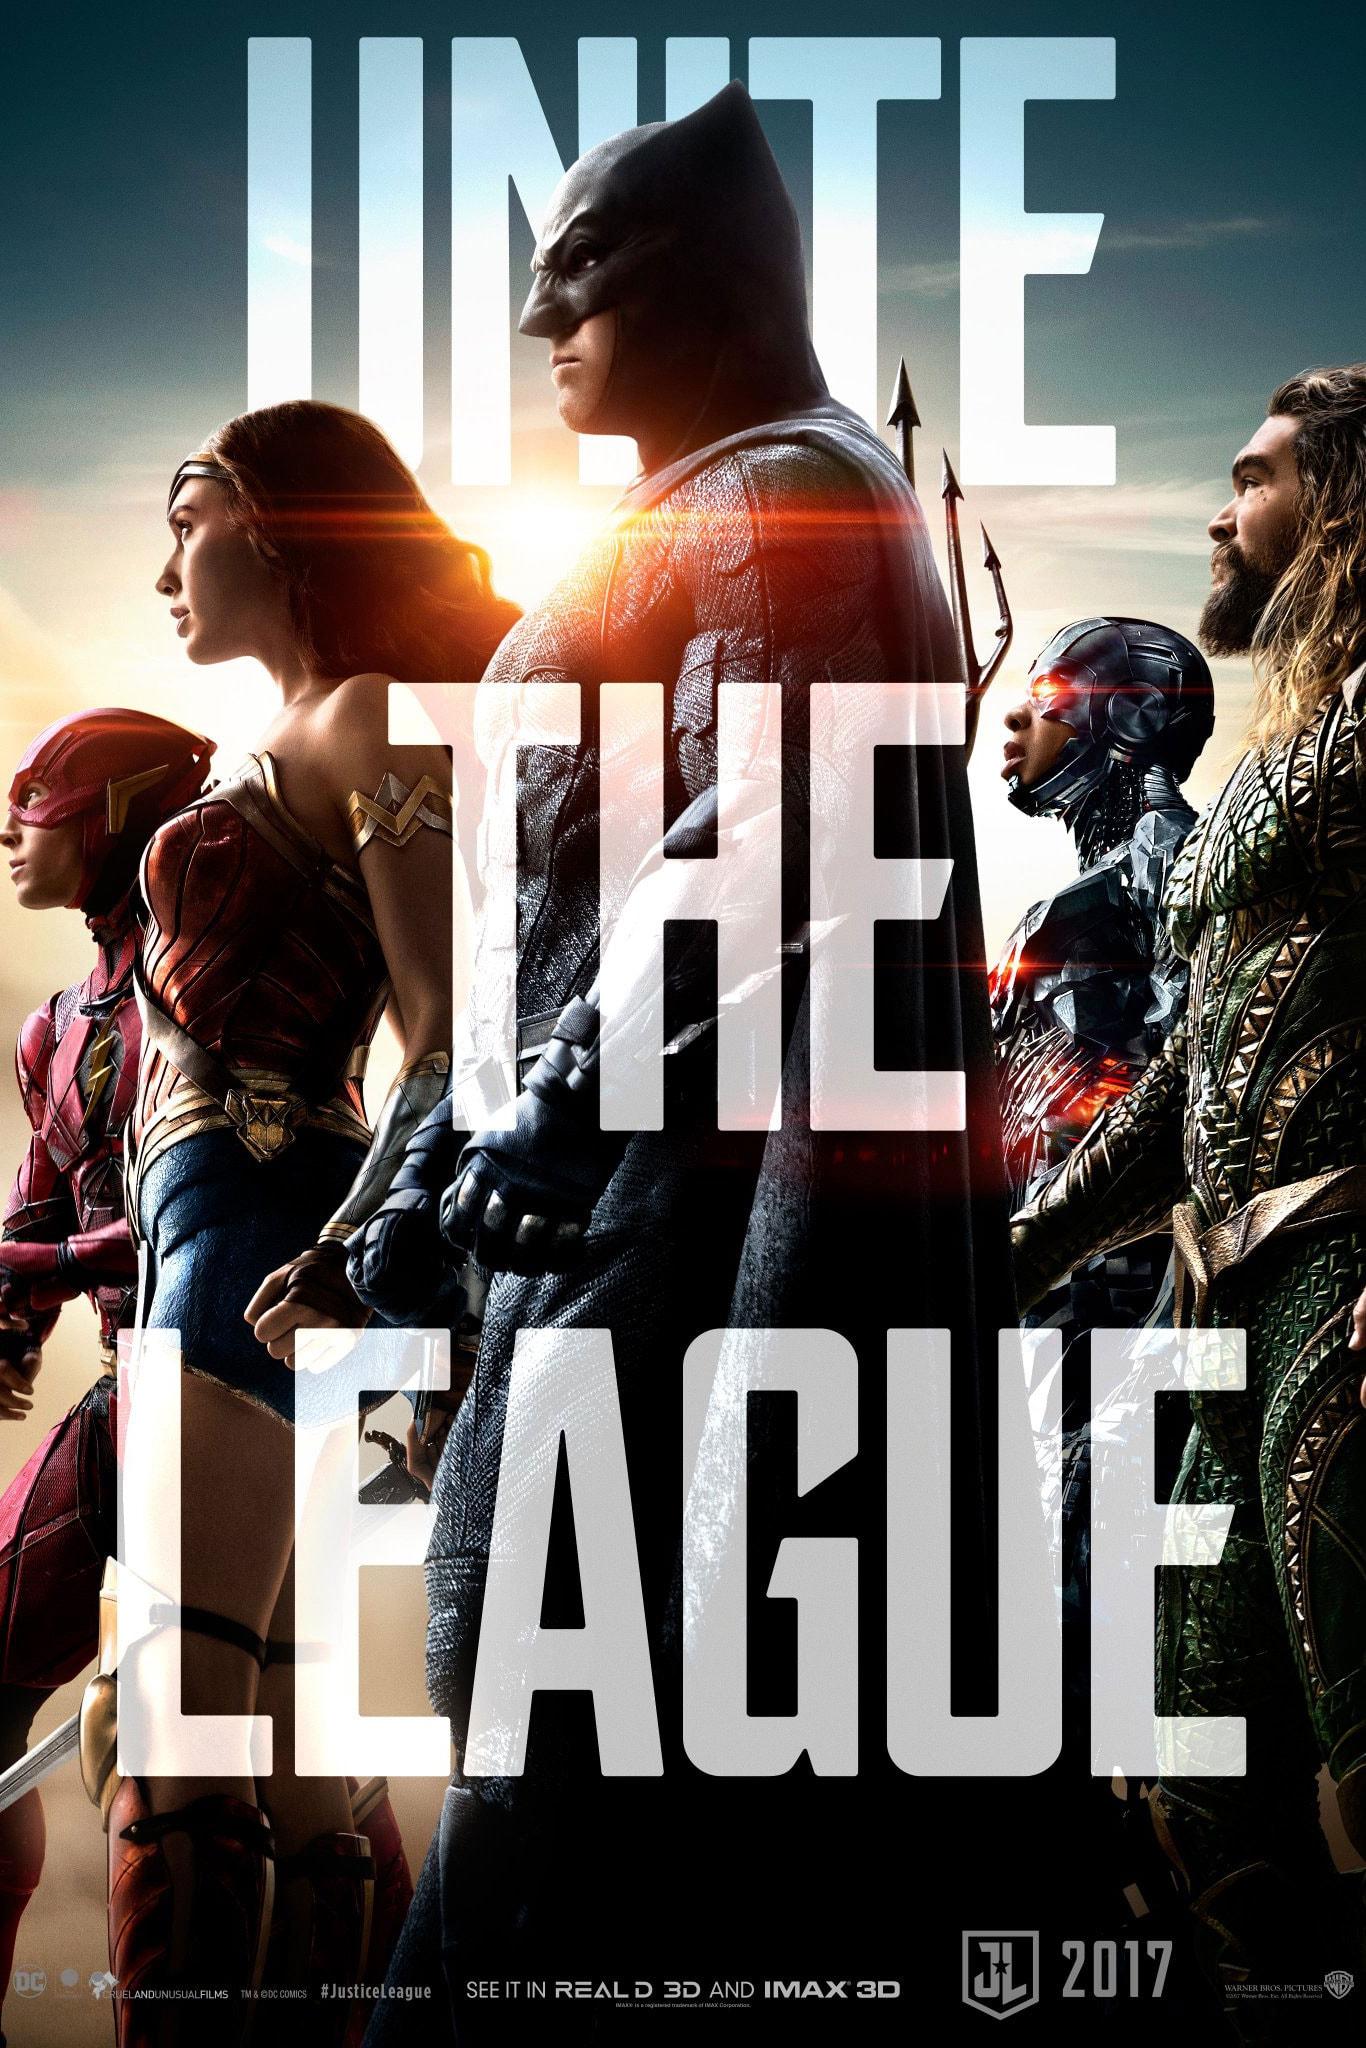 Martha 發聲 - Diane Lane:《Justice League》不會比《The Avengers》好看...